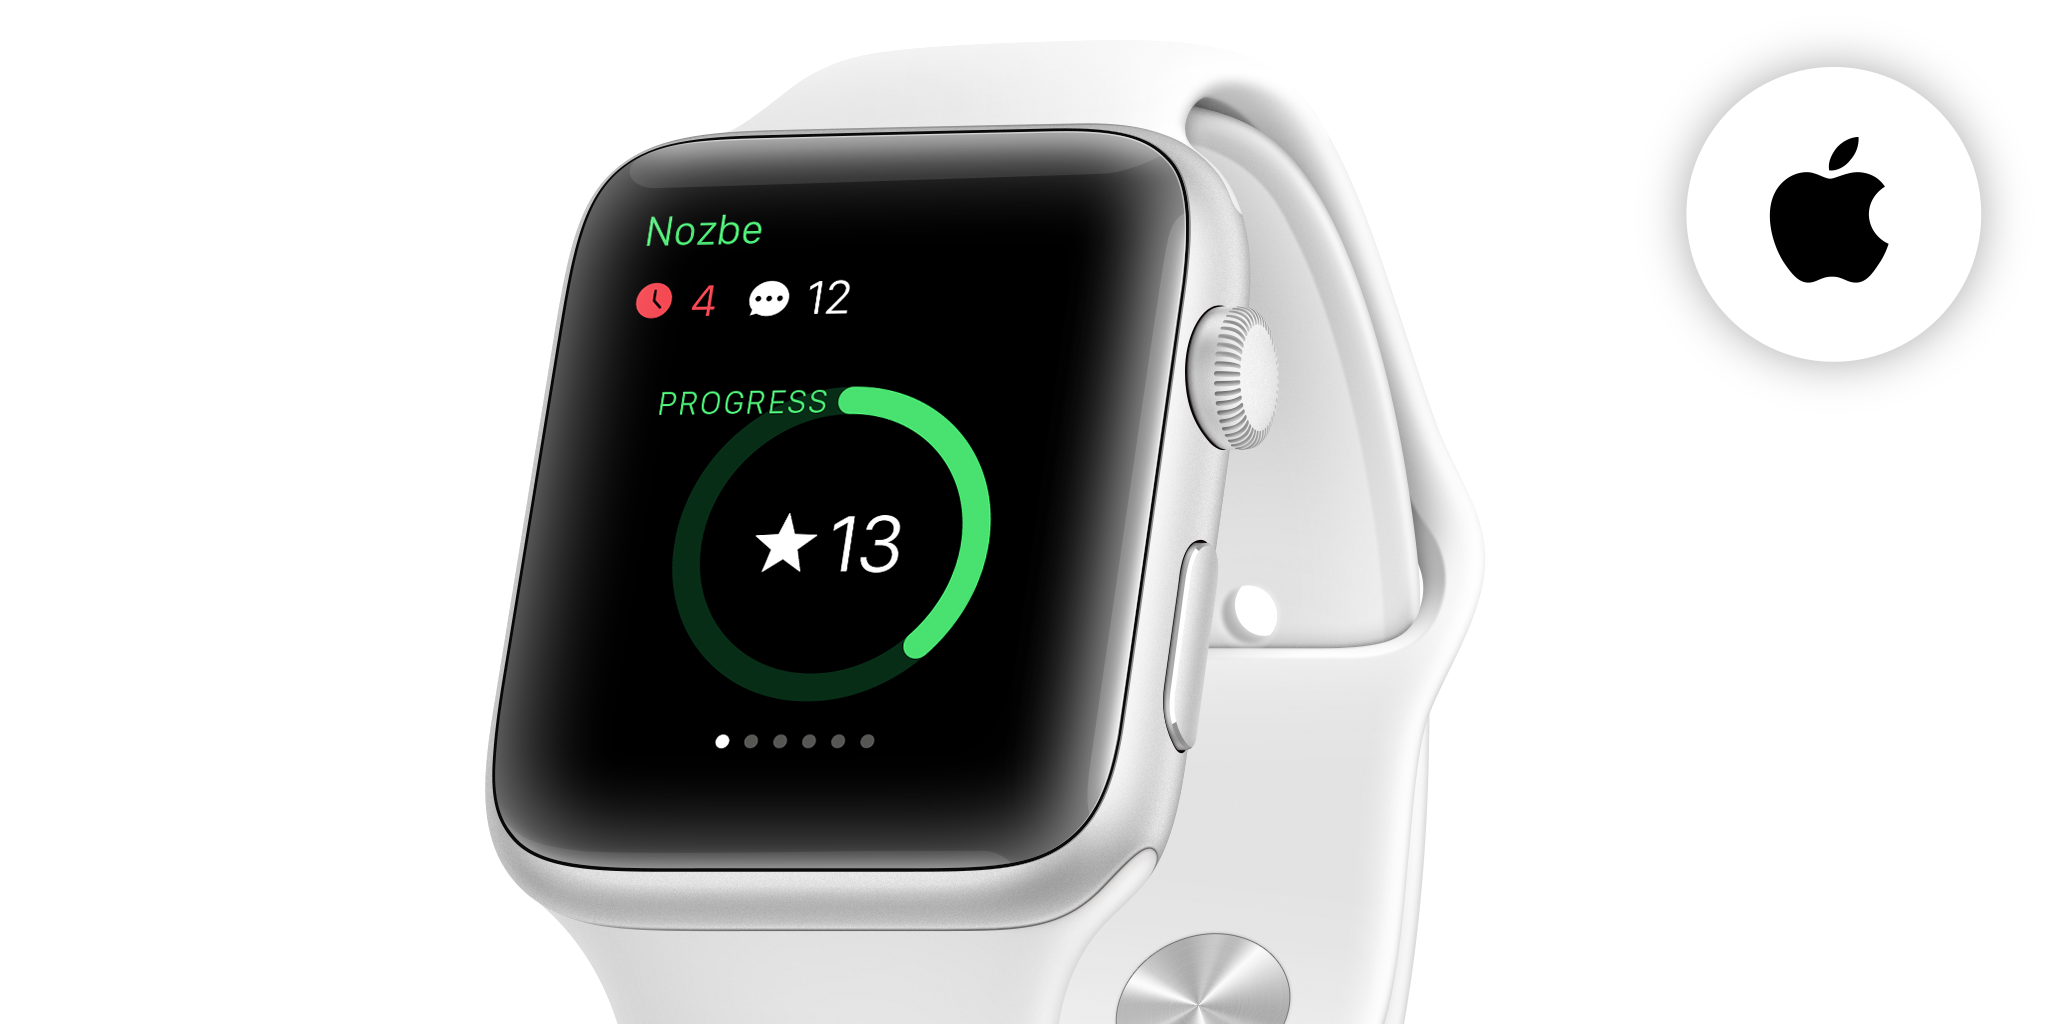 Nozbe Apps :: Nozbe Help